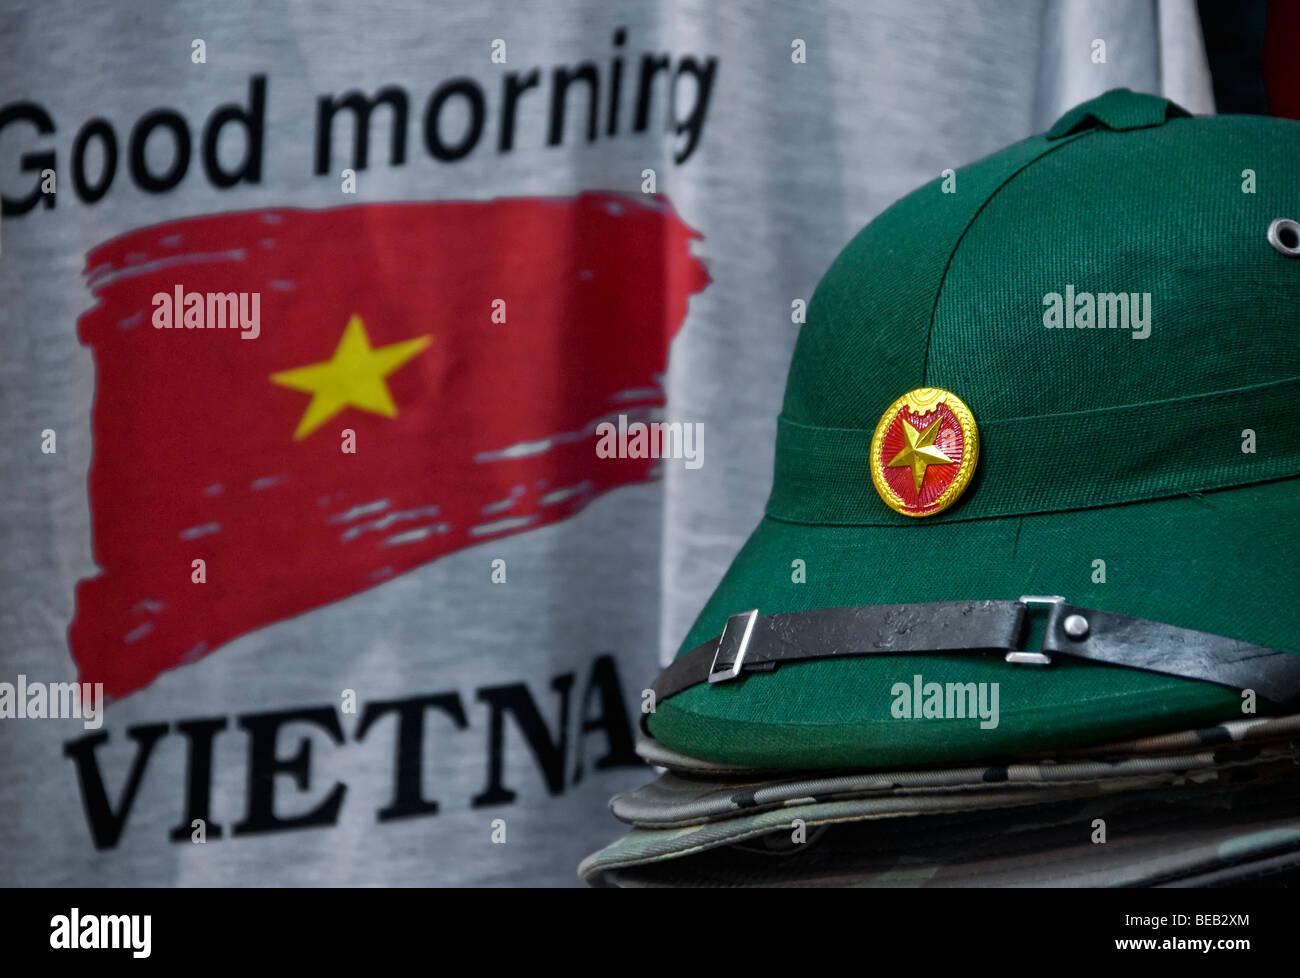 Guten Morgen Vietnam Touristische Souvenirs Ho Chi Min